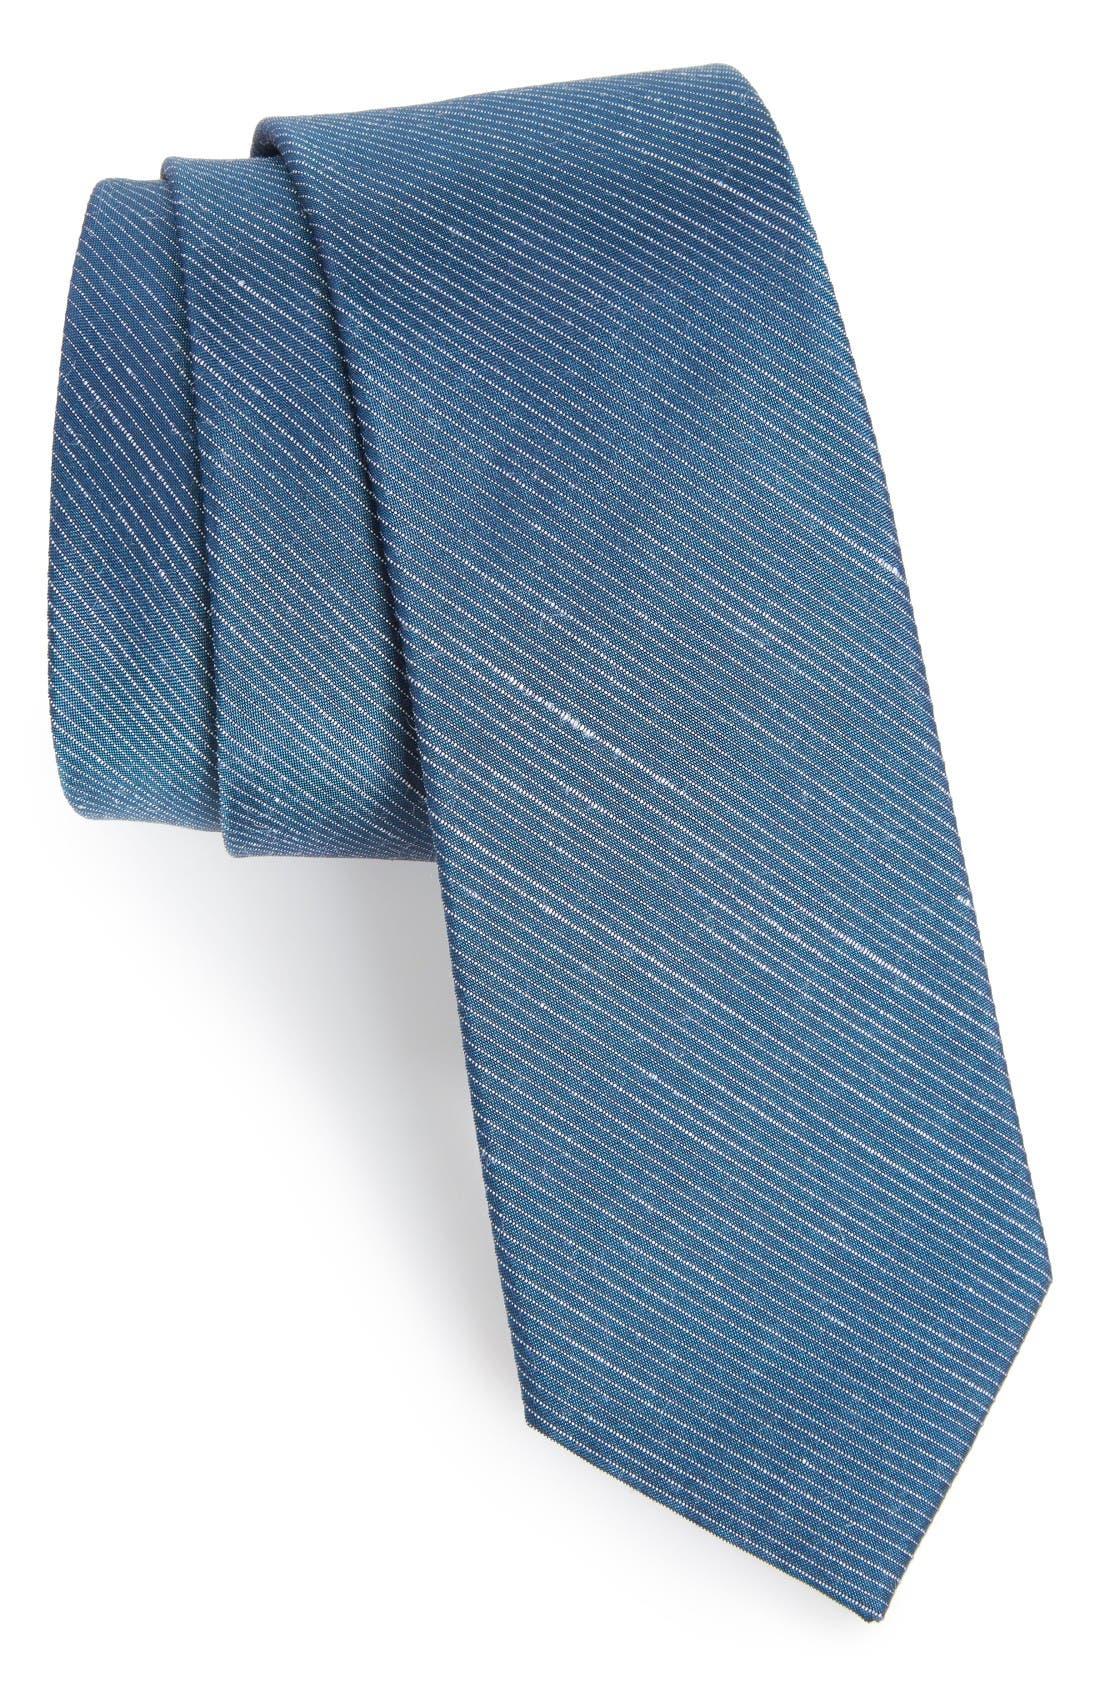 Pinstripe Silk & Linen Tie,                         Main,                         color, Serene Blue